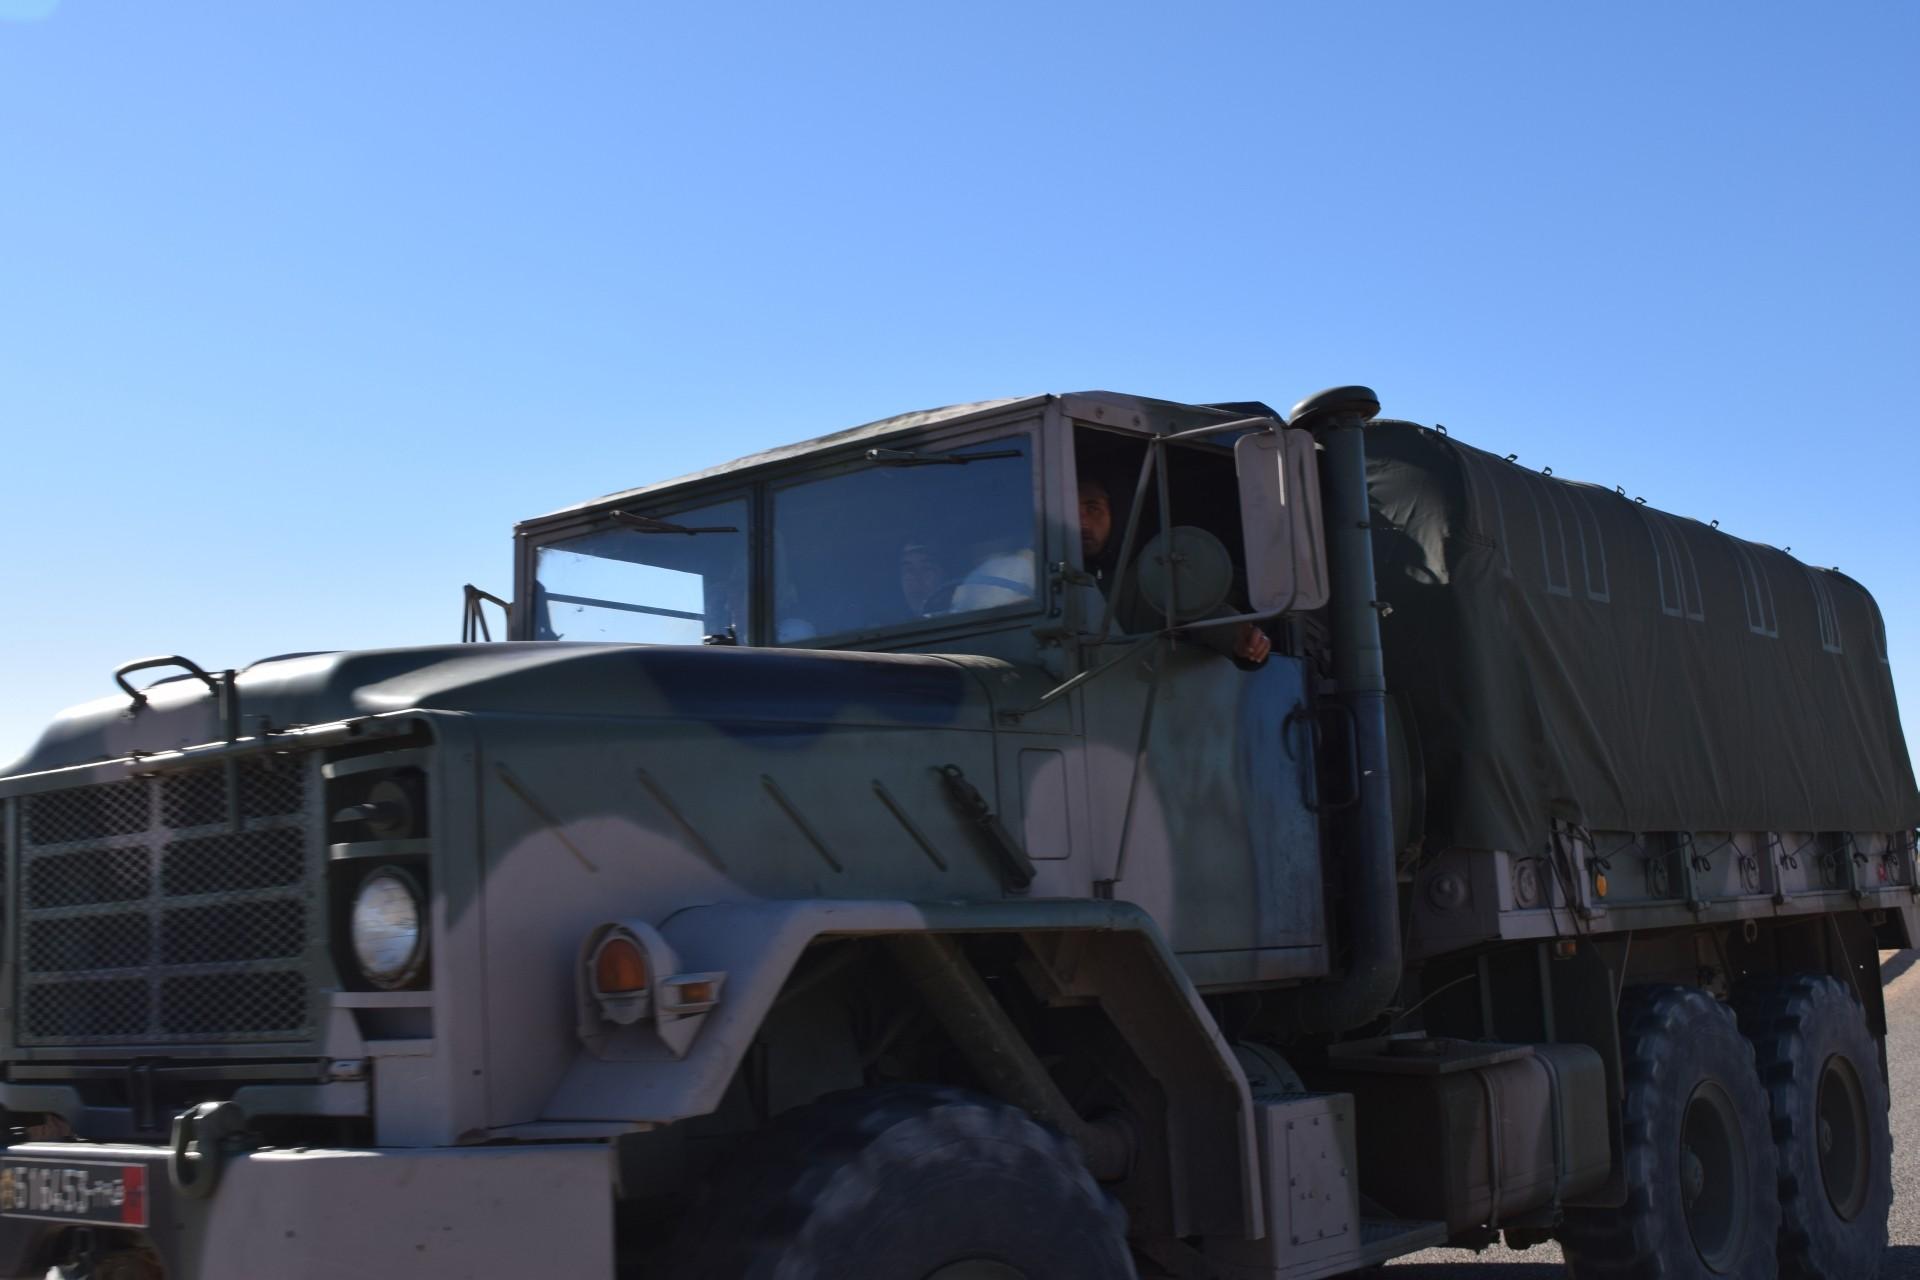 Photos - Logistique et Camions / Logistics and Trucks - Page 4 Clipbo33